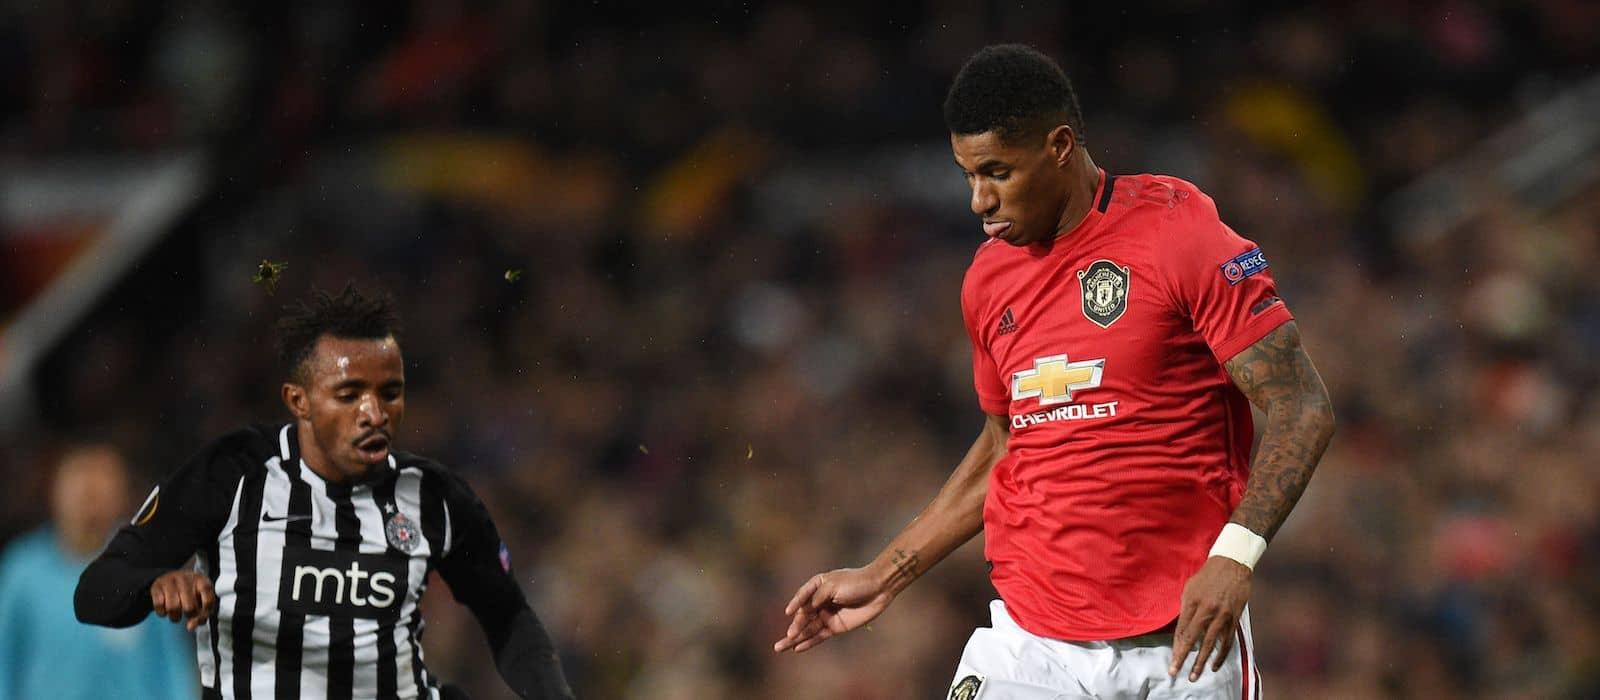 Marcus Rashford impresses Manchester United fans with latest performance